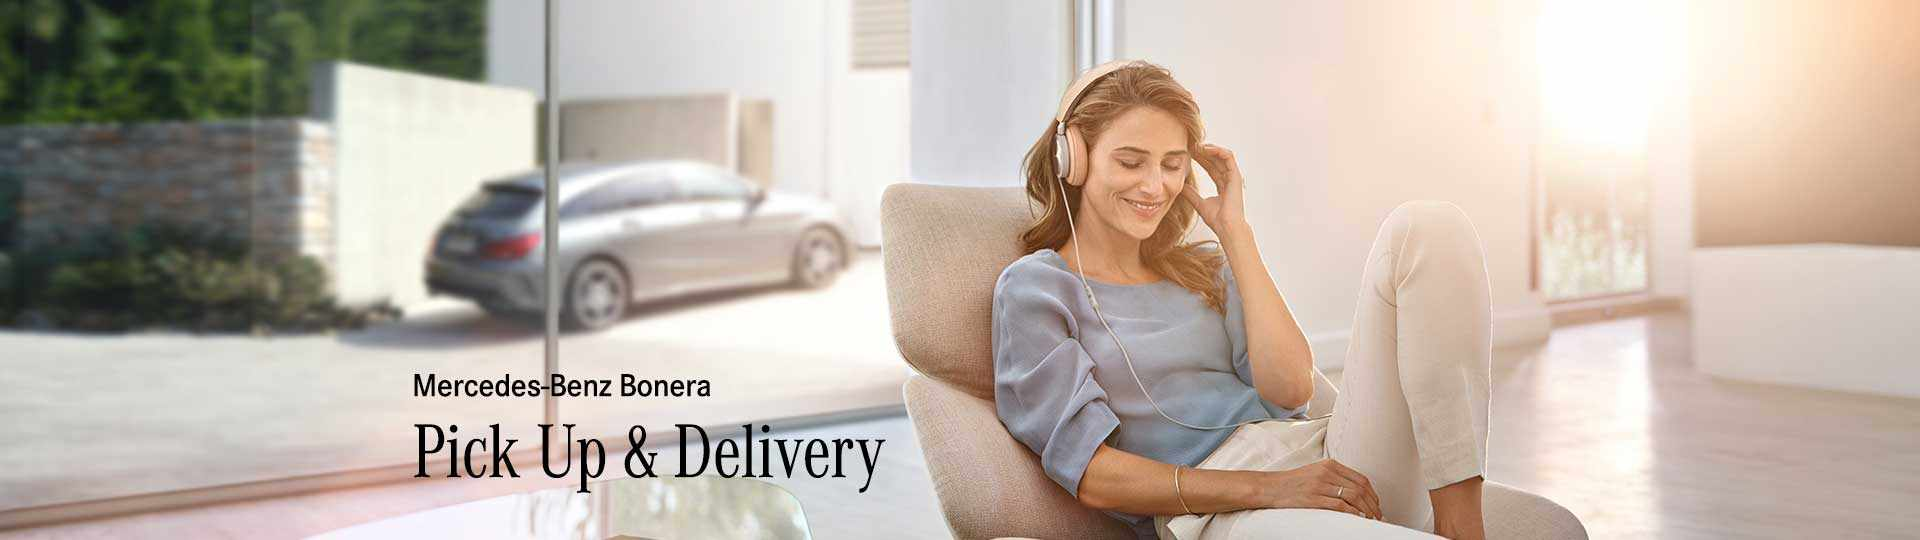 header_mercedesbenz_bonera_pickup_and_delivery.jpg